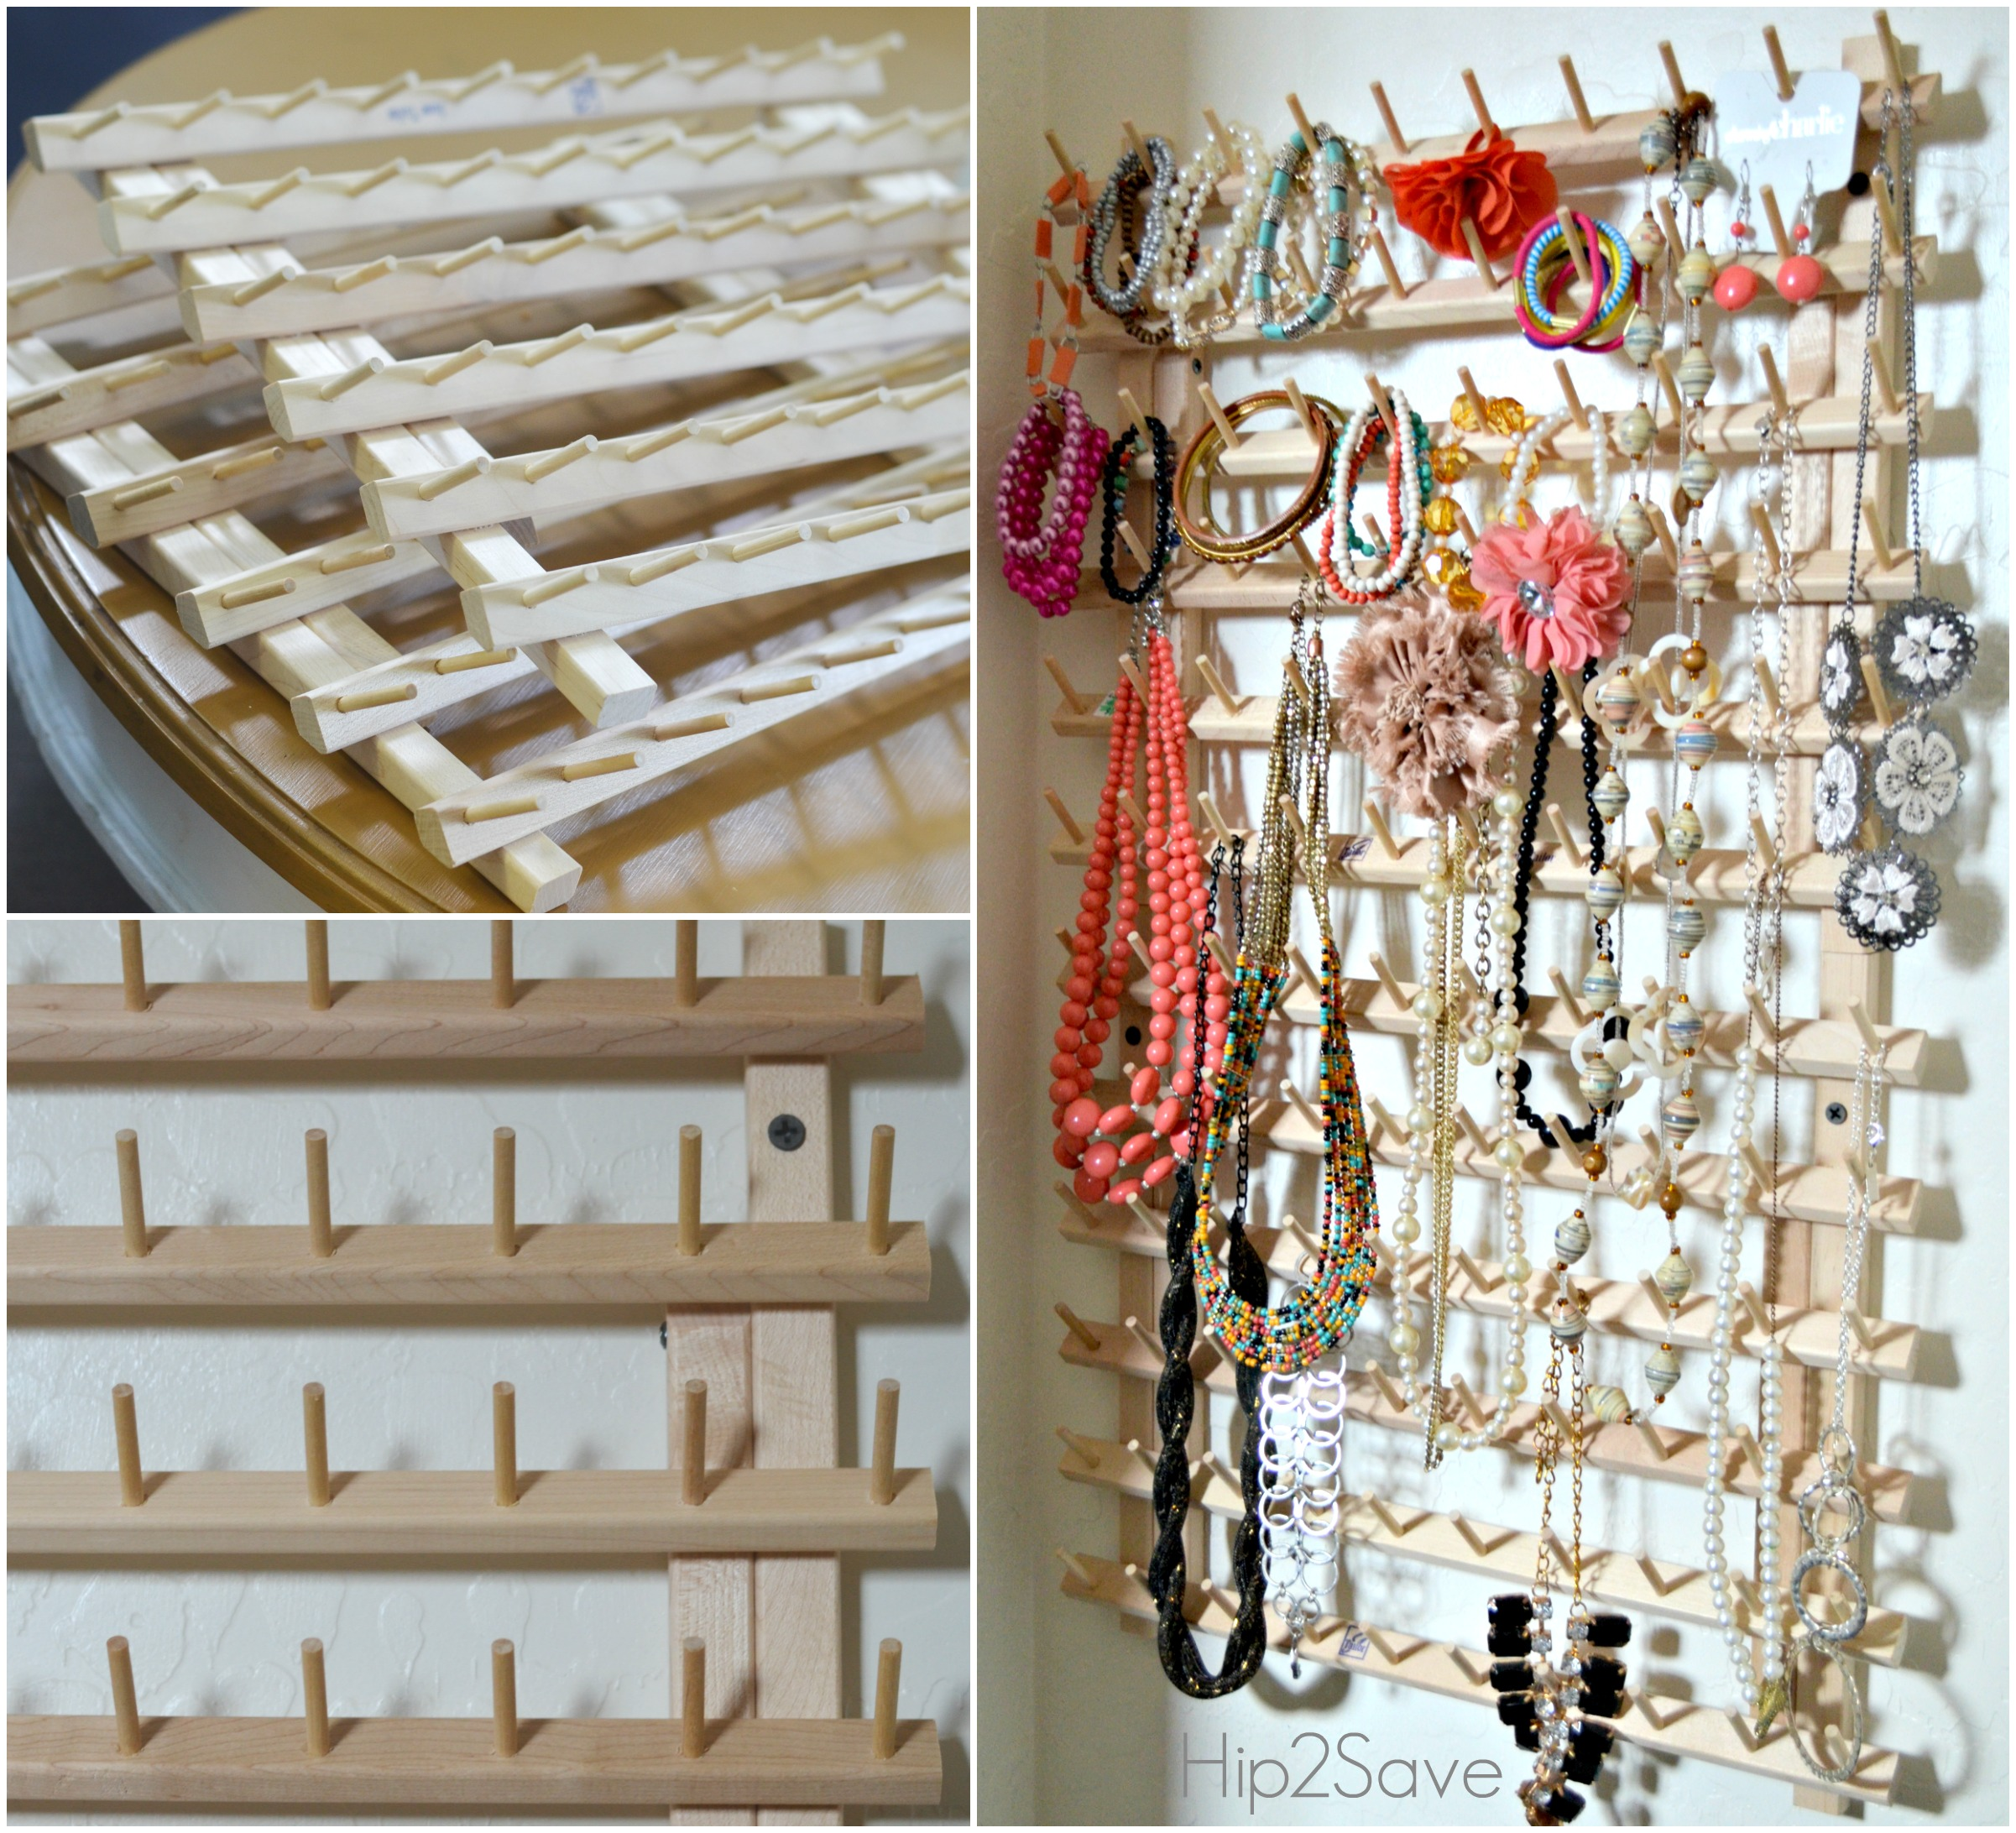 A Thread Rack Makes a Great Jewelry Organizer Hip2Save.com